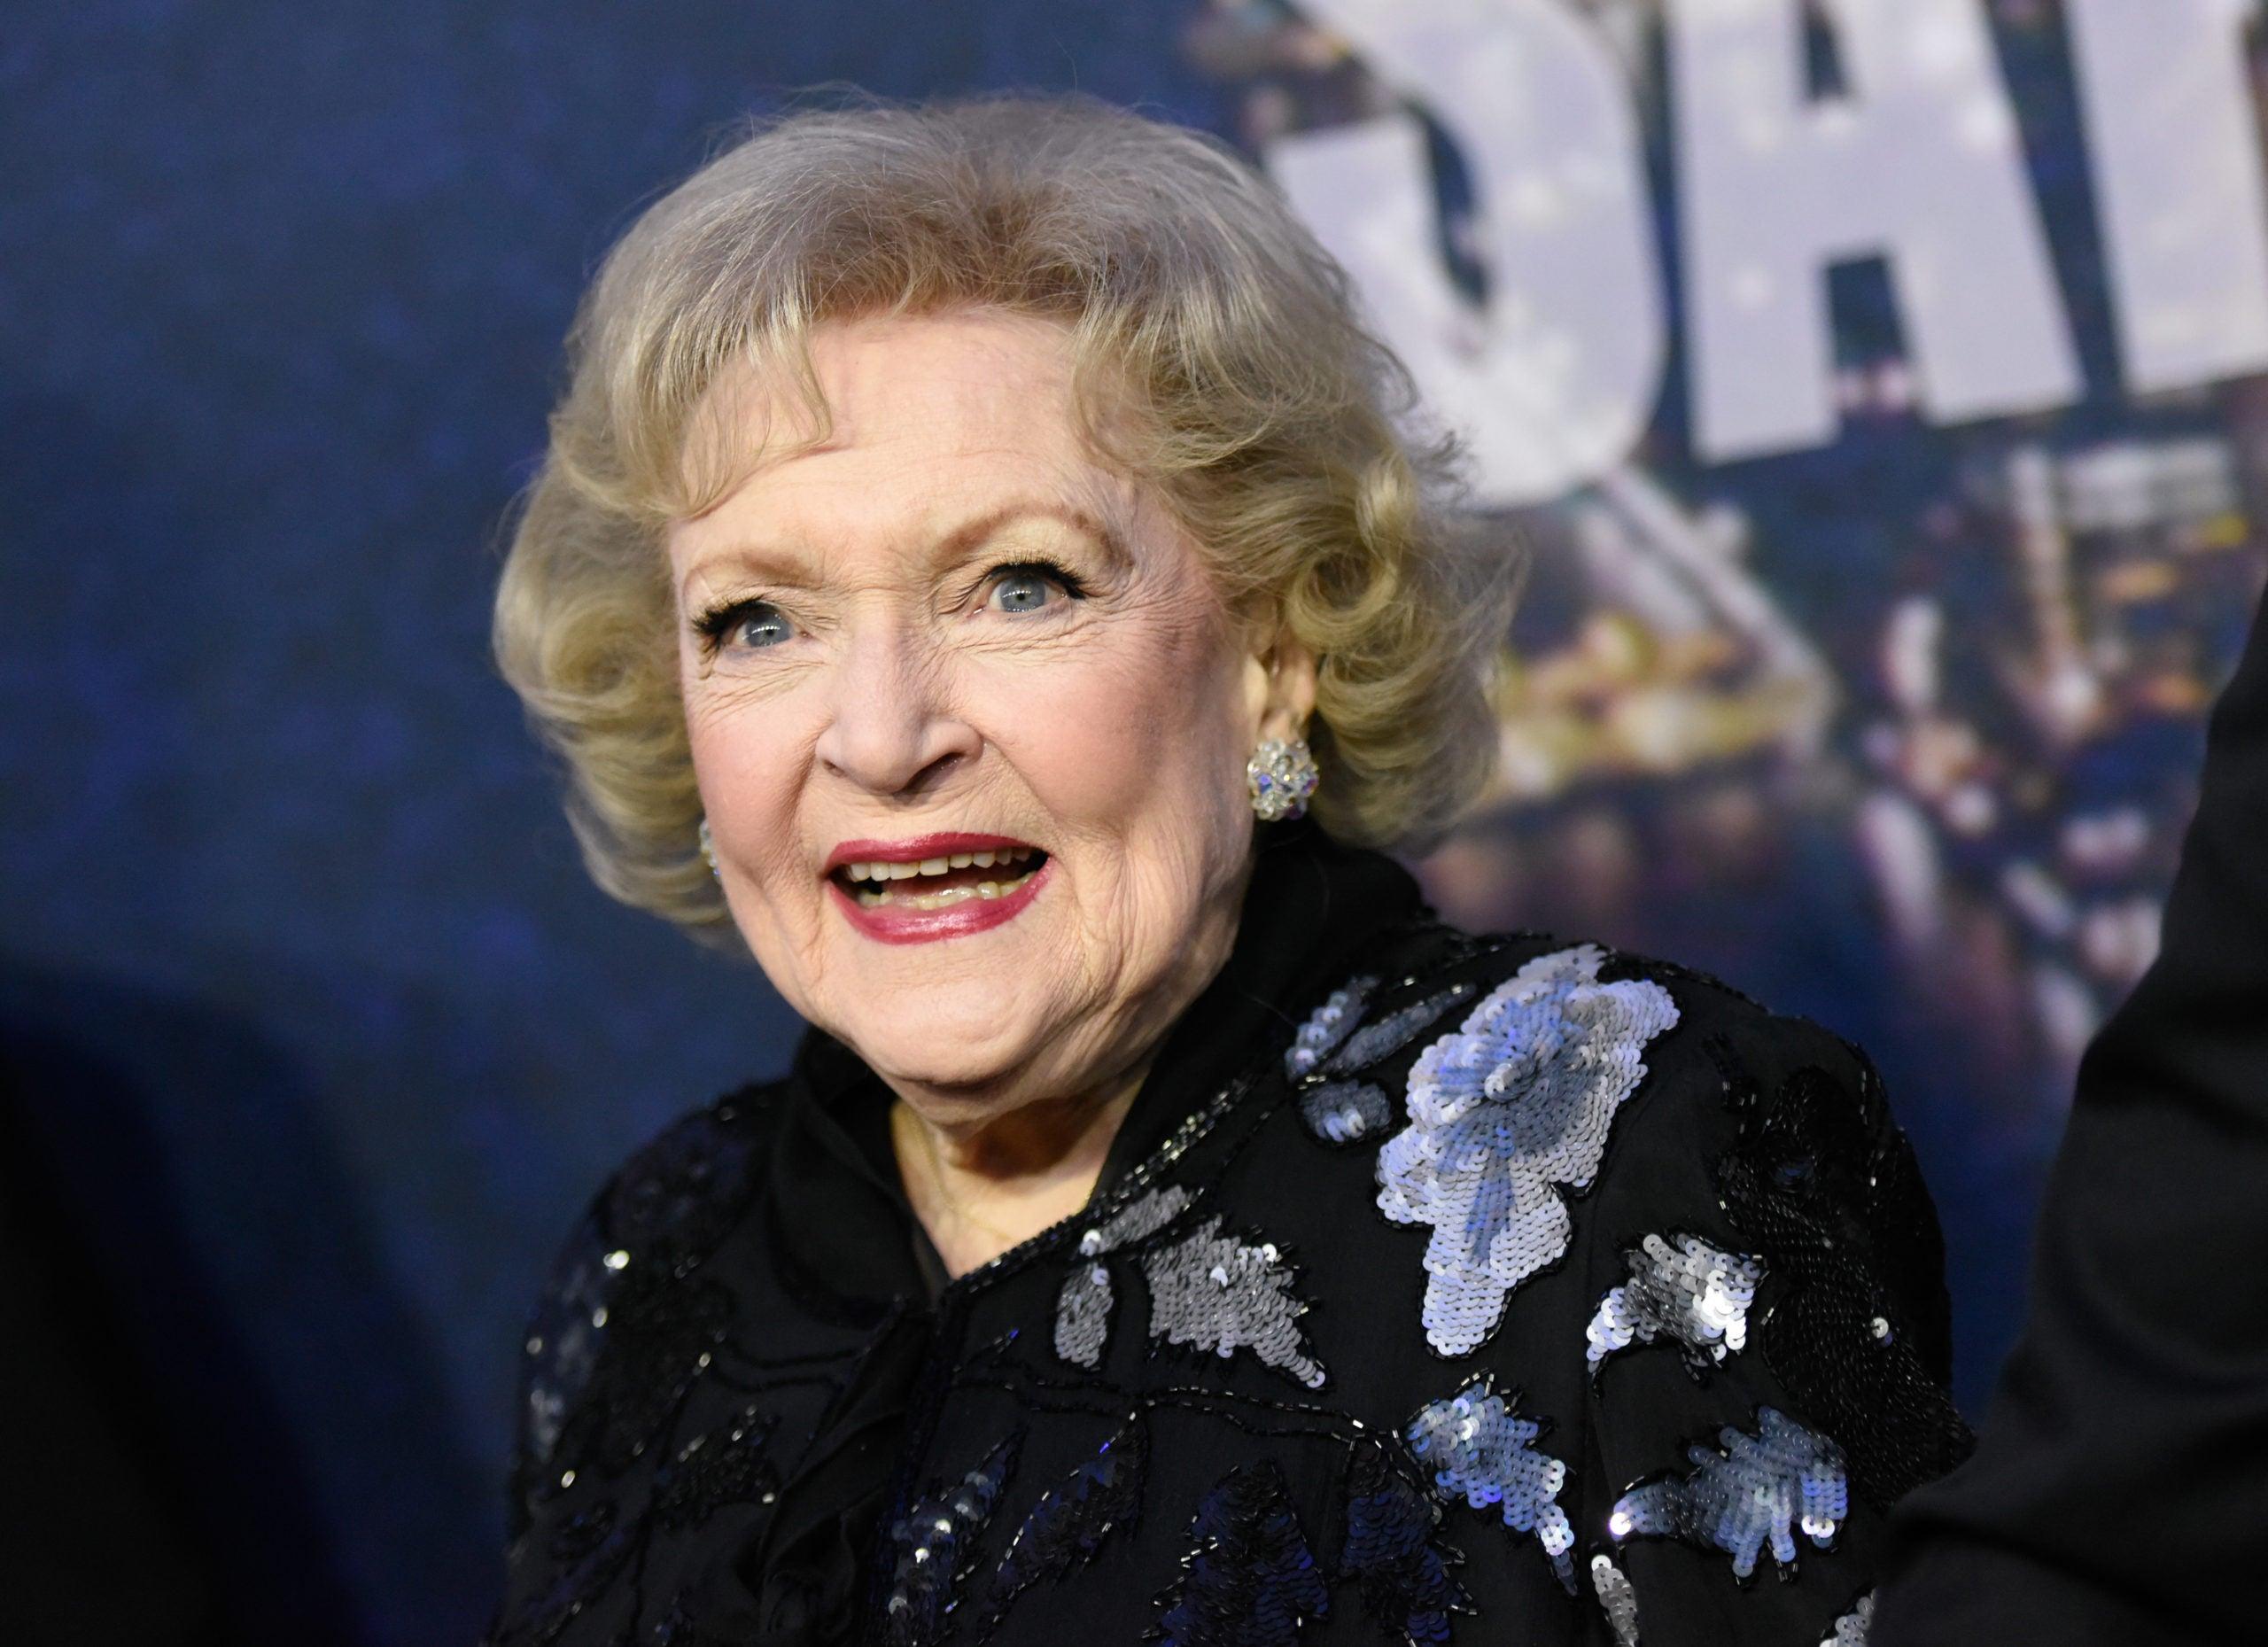 Betty White celebrates 94th birthday - WISH-TV ...